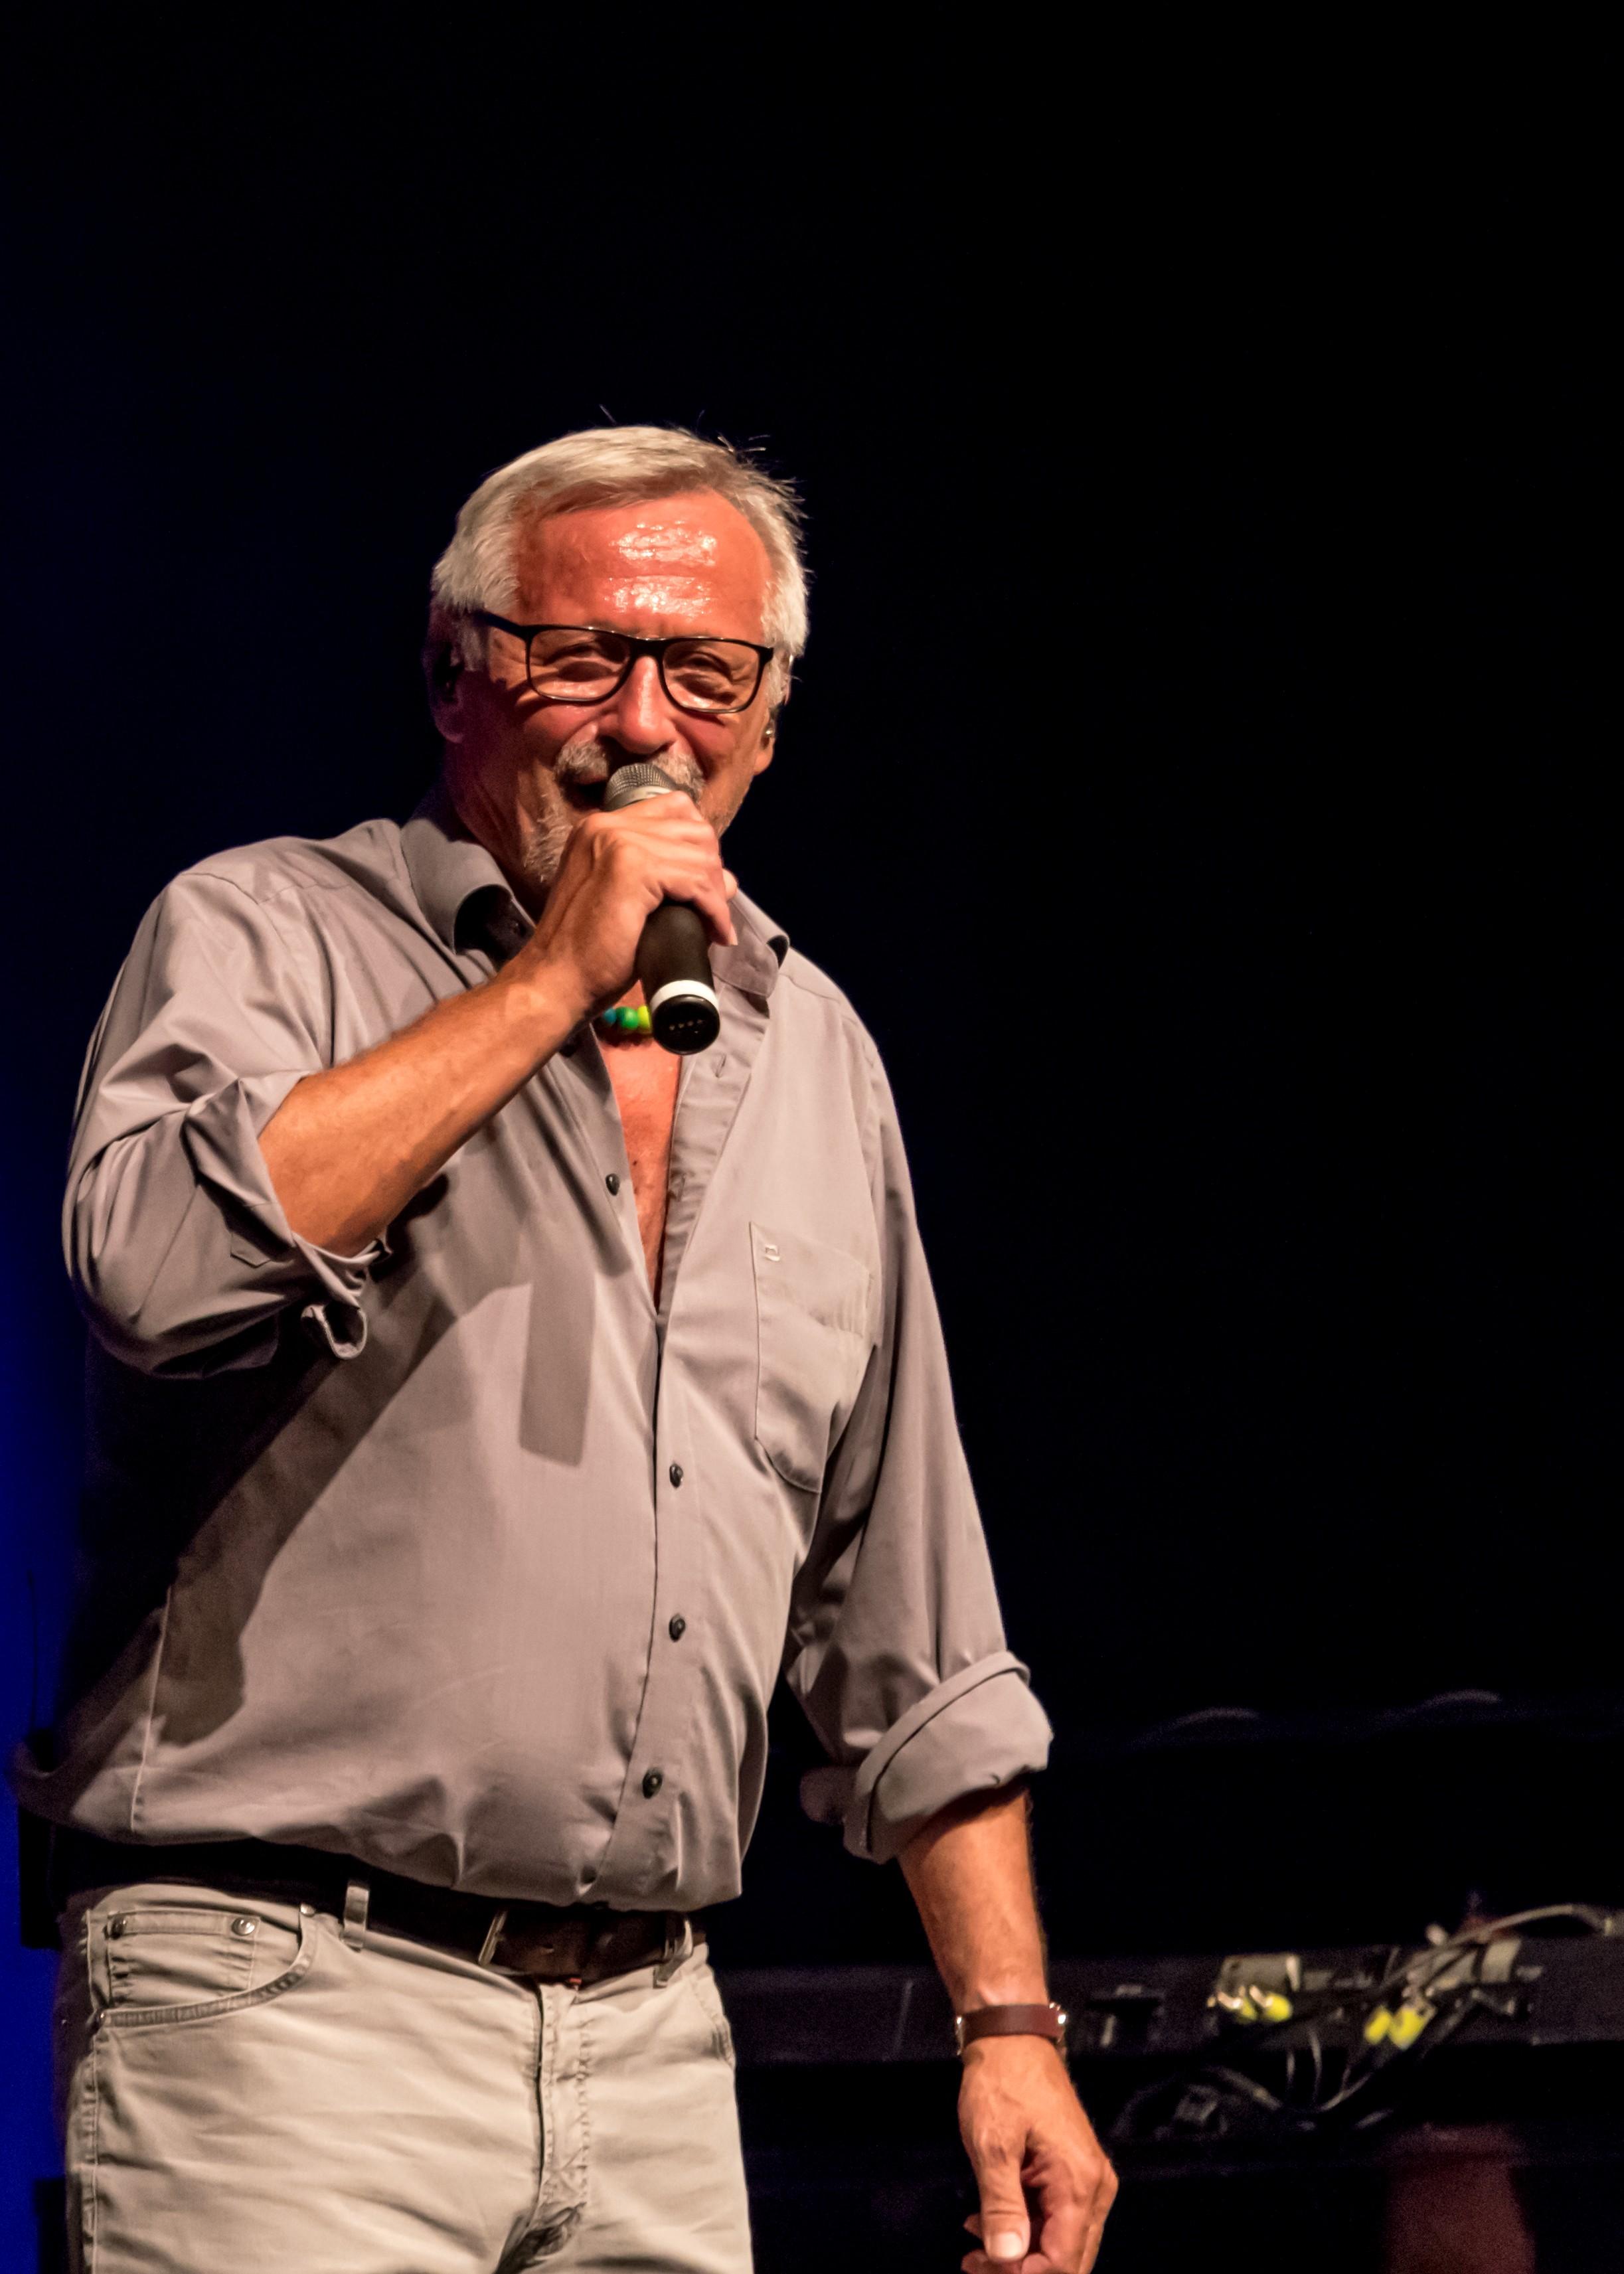 Konstantin Wecker    Zelt-Musik-Festival 2017 in Freiburg, Germany